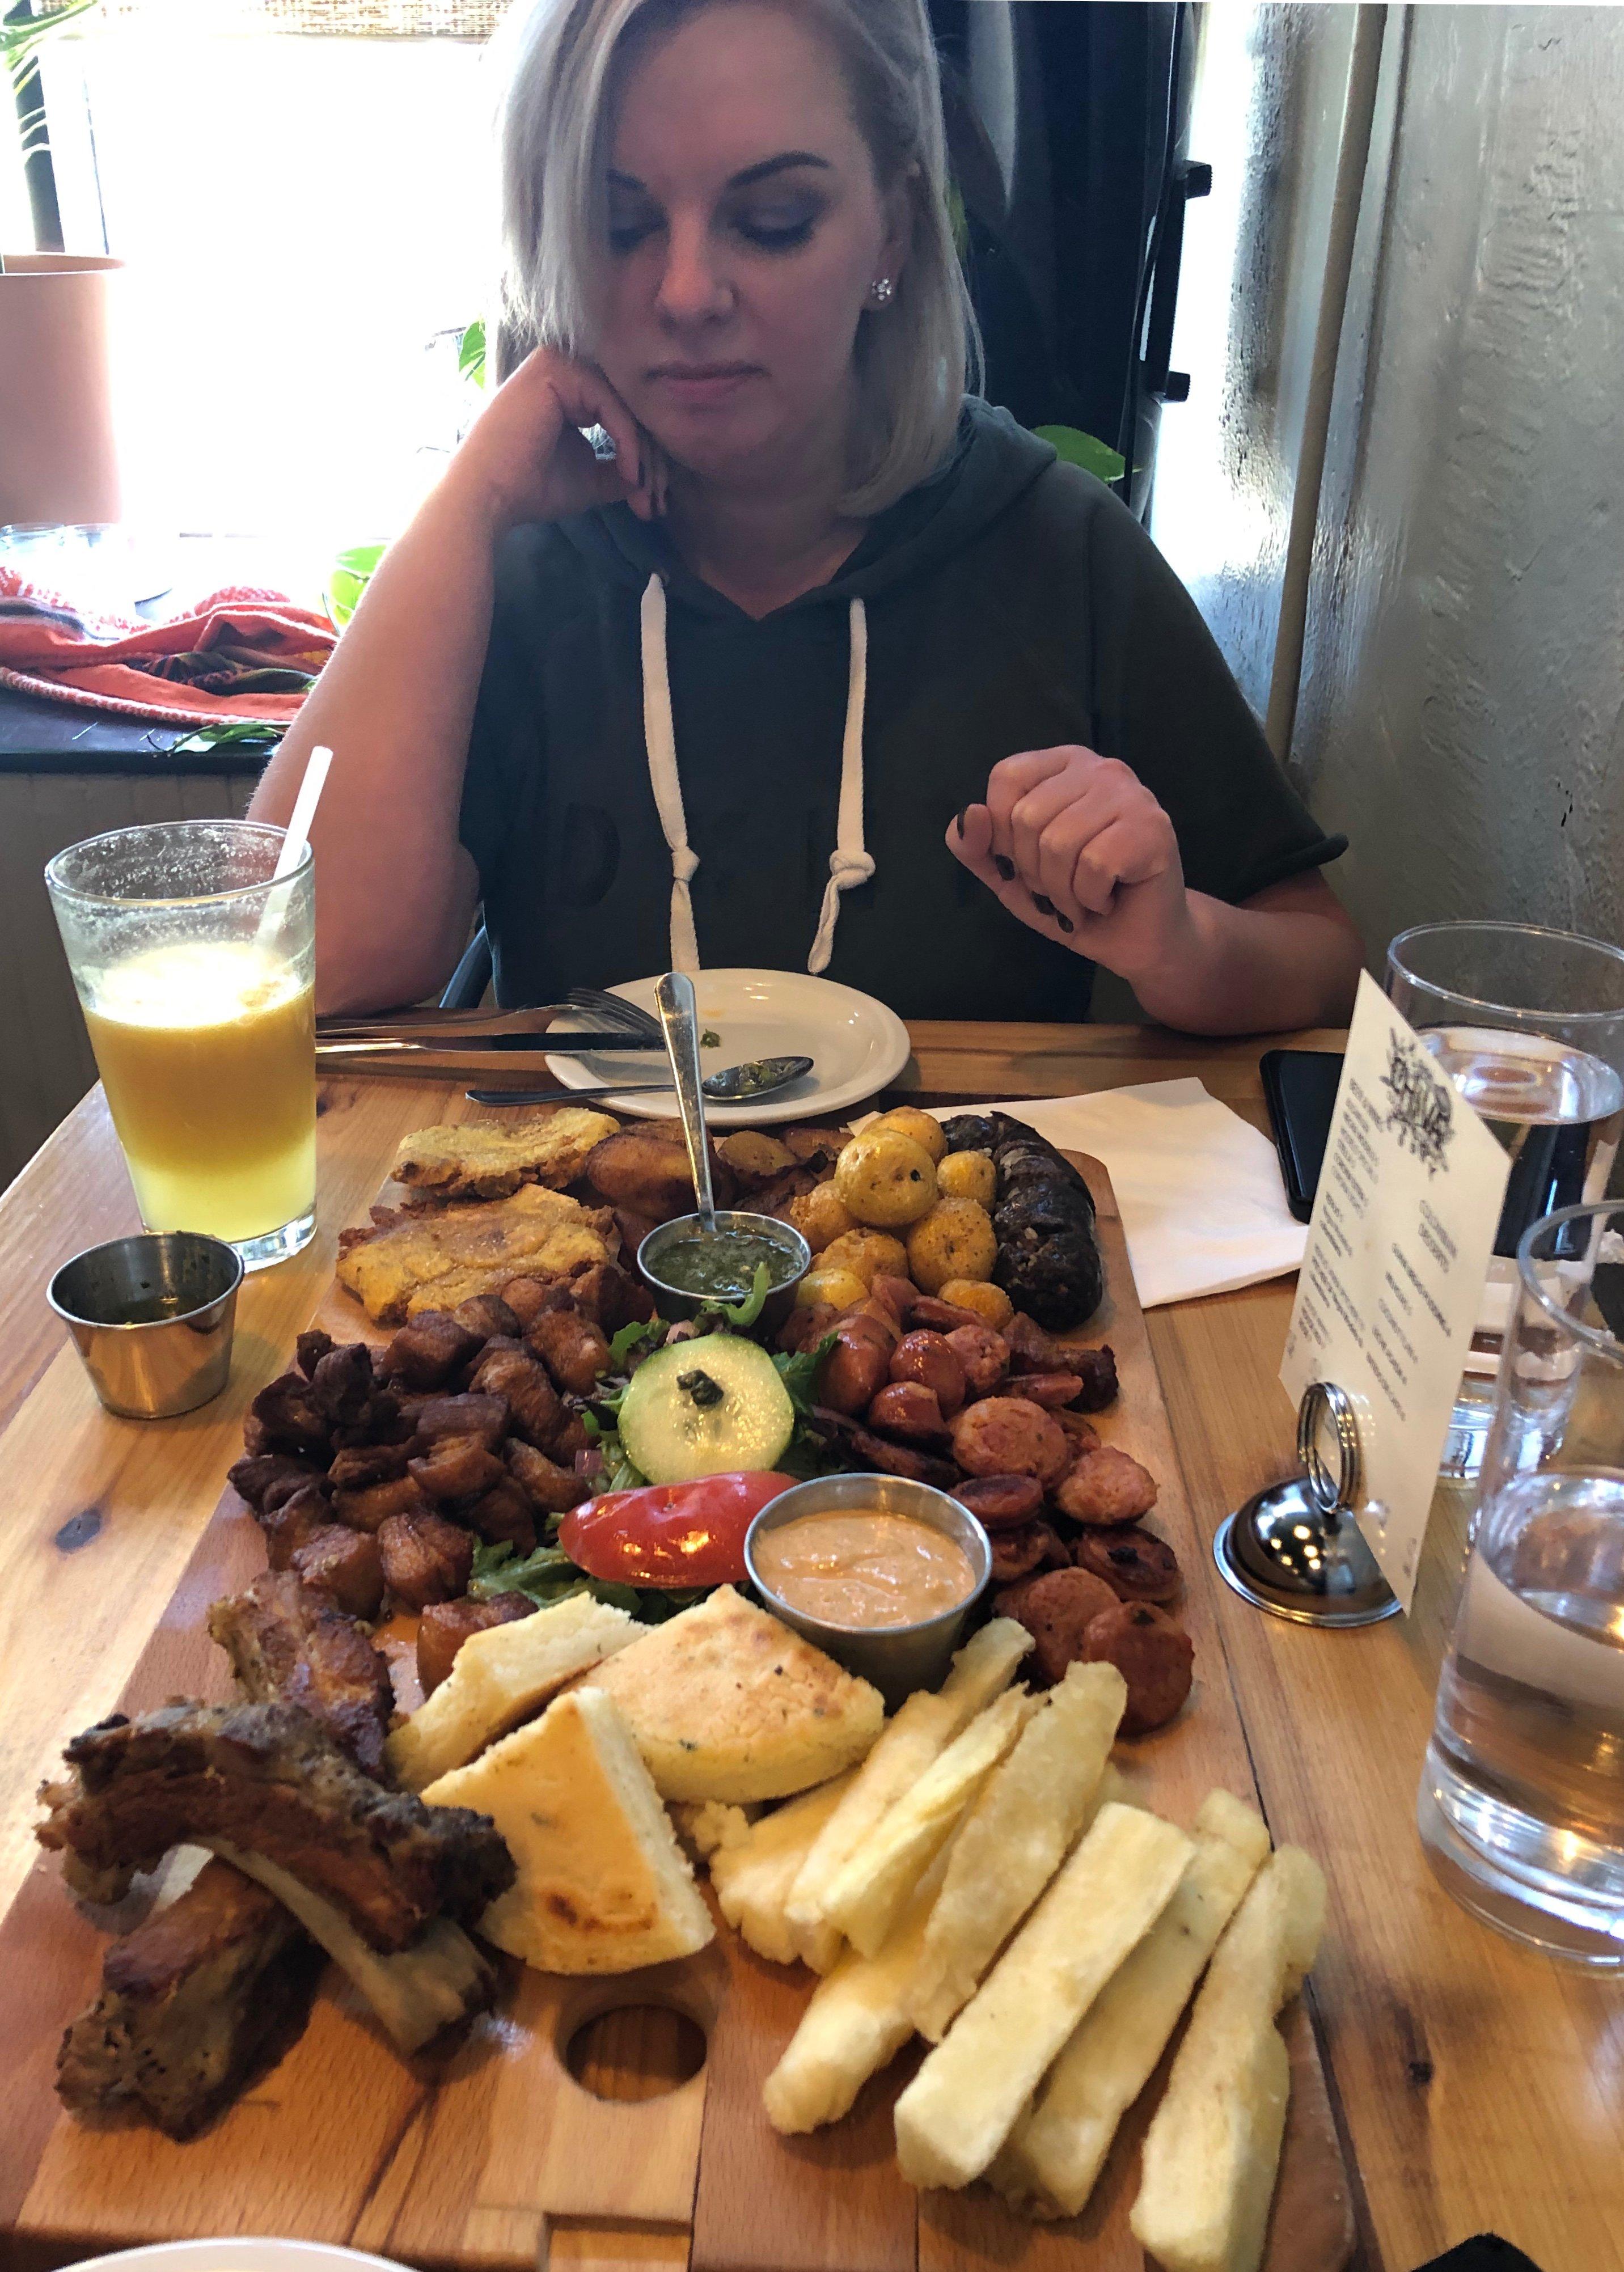 La Chiva Colombian Cuisine 1417 S Broadway, Denver